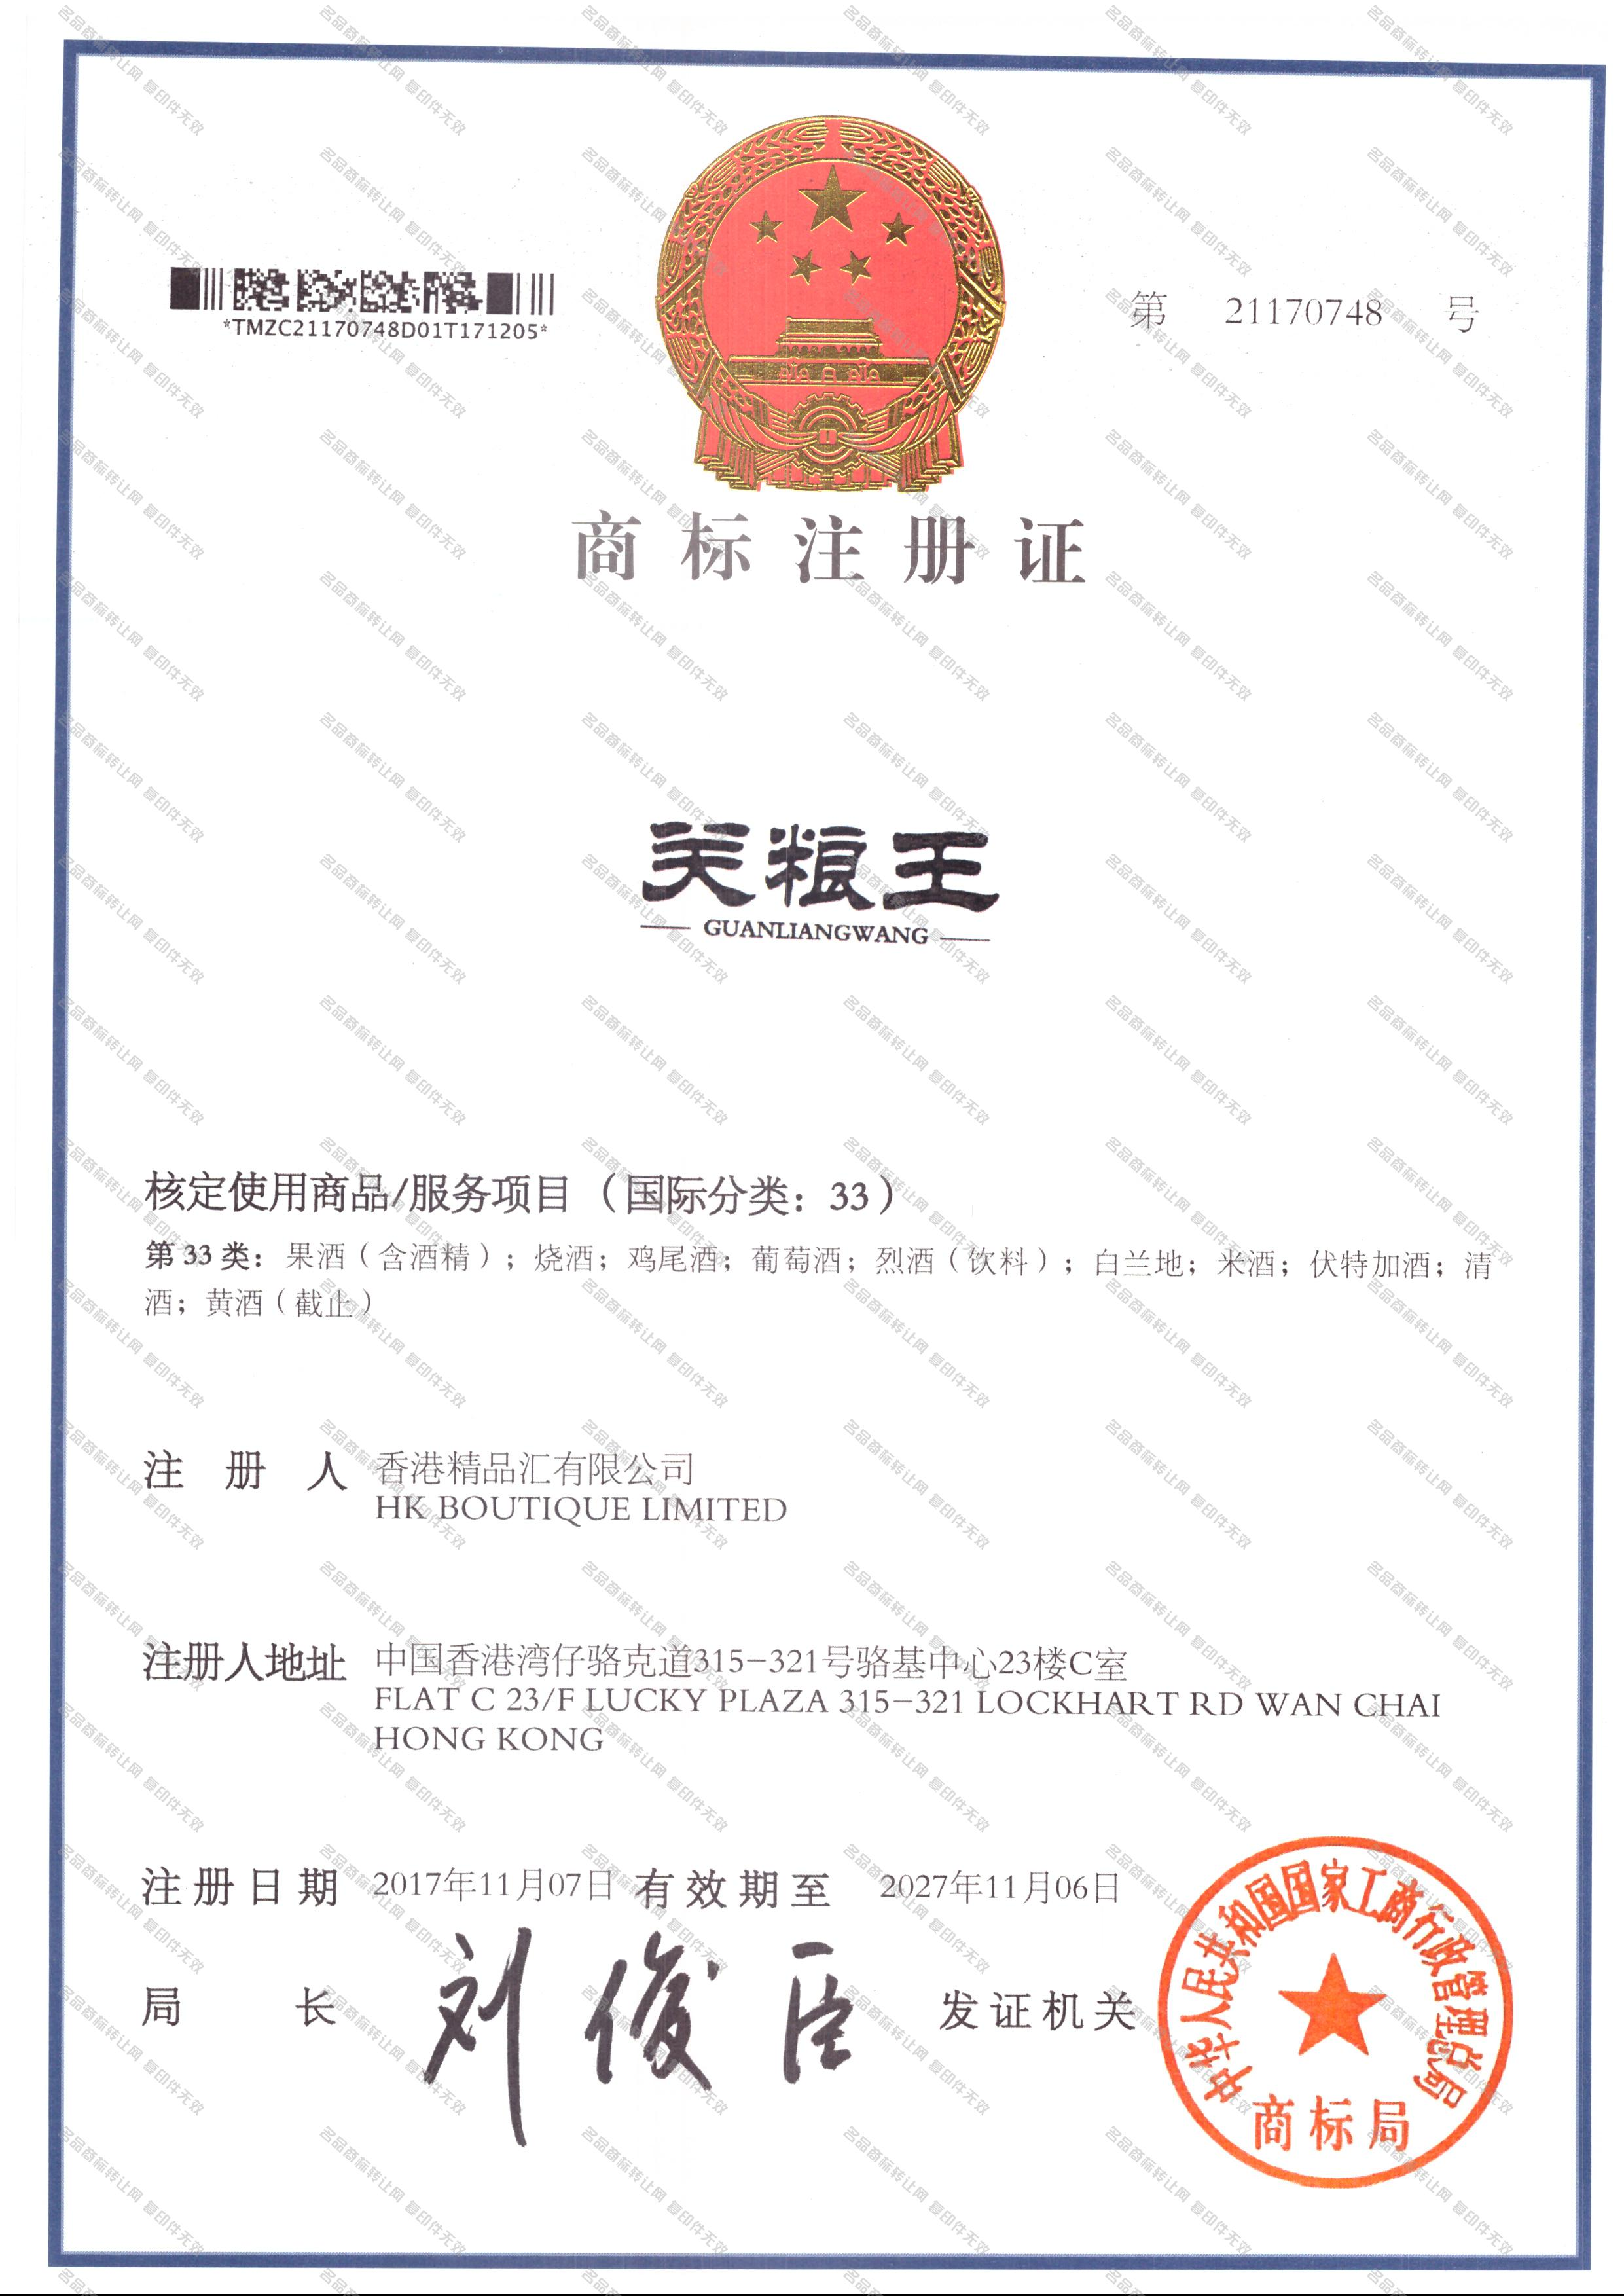 关粮王 GUANLIANGWANG注册证